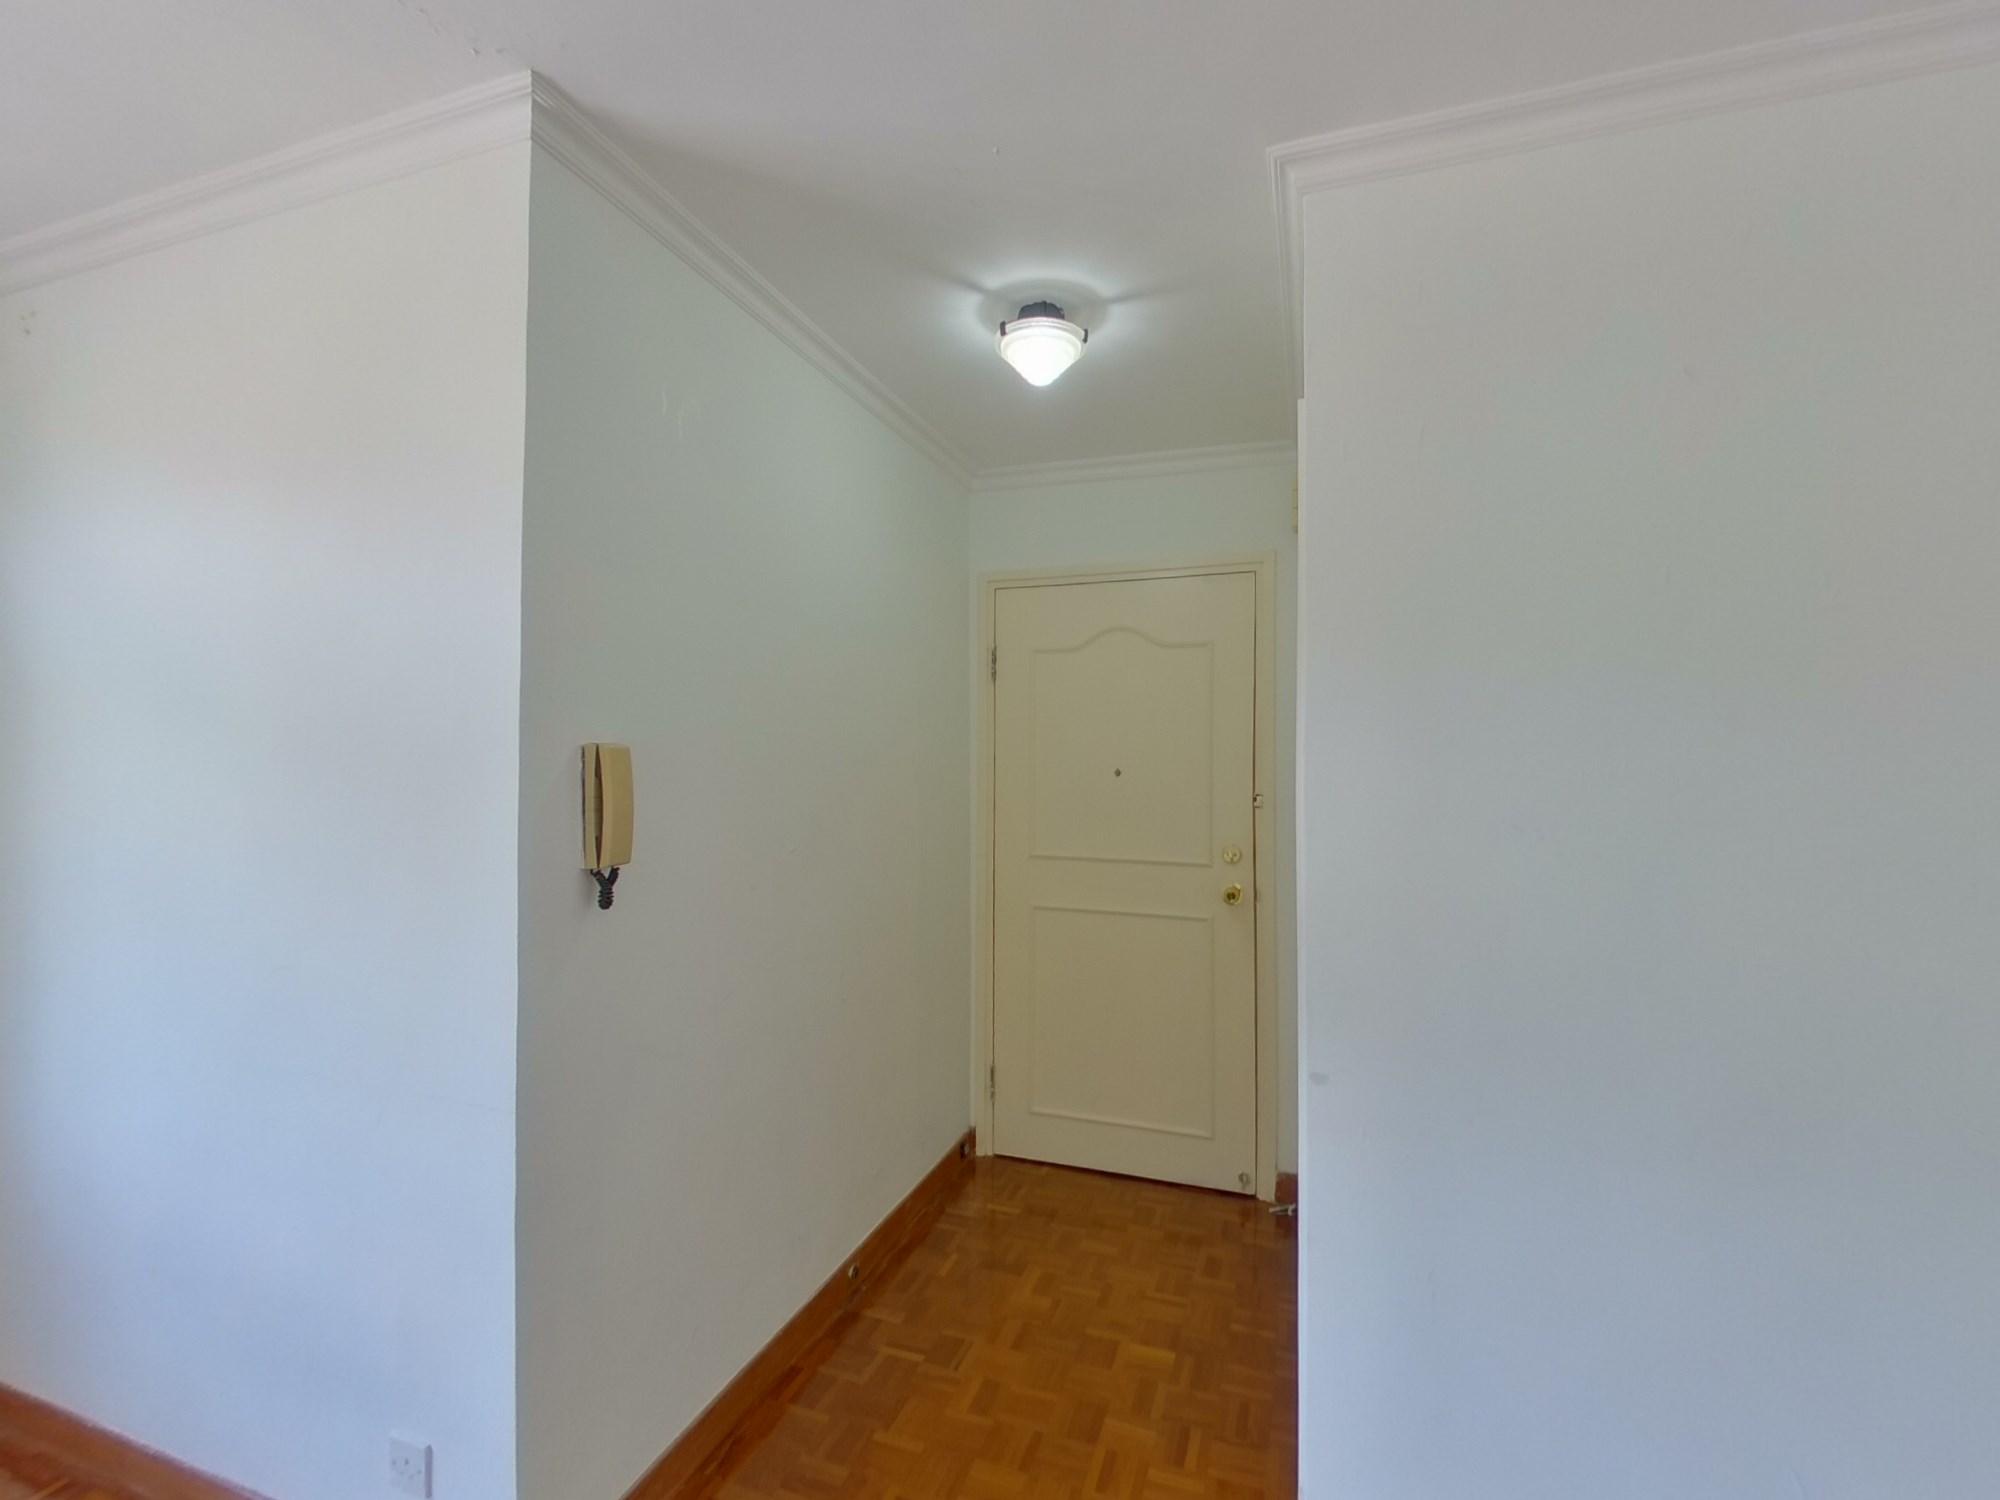 Heng Fa Chuen HENG FA CHUEN Middle Floor House730-3797267